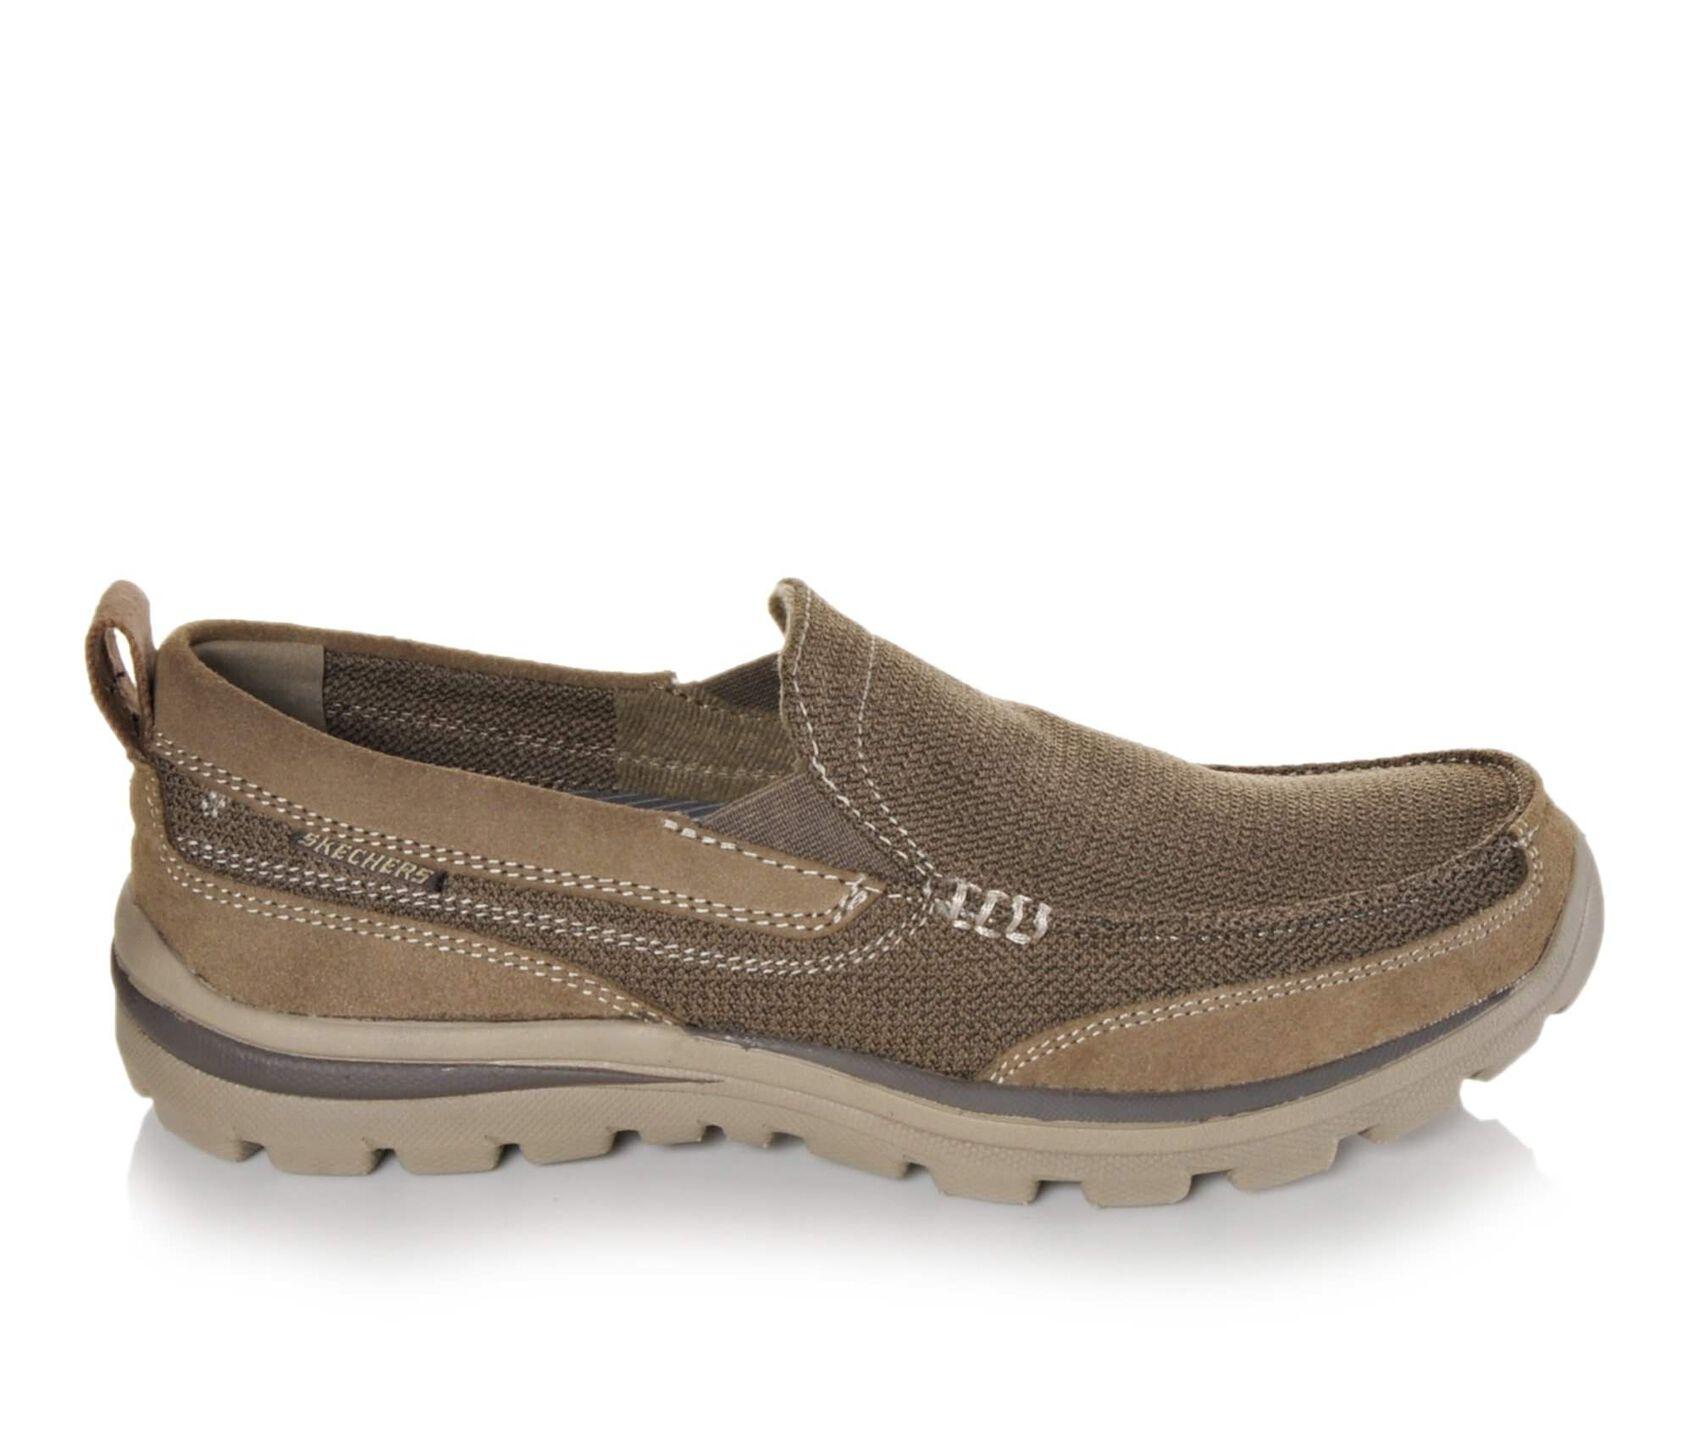 18e8fea93 Men's Skechers Milford 64365 Casual Shoes | Shoe Carnival